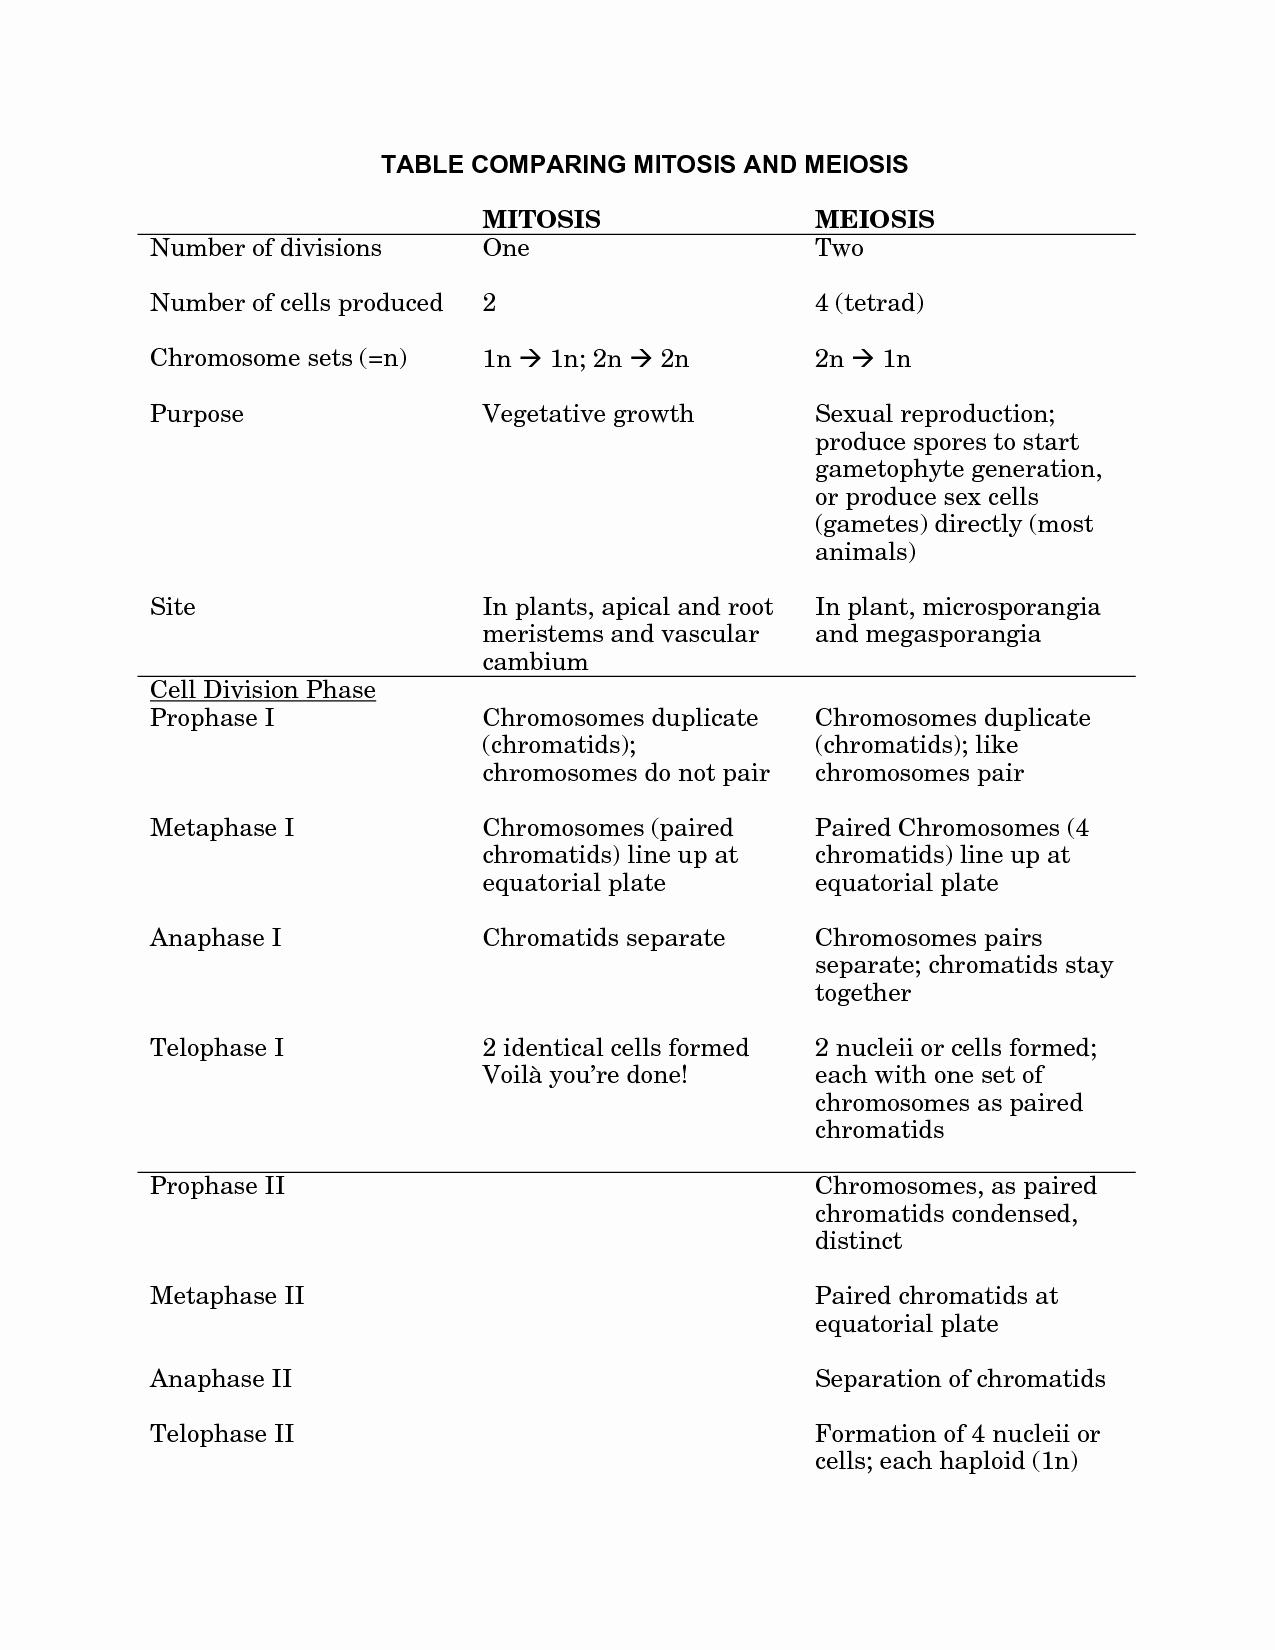 Mitosis Vs Meiosis Worksheet Answers Luxury Meiosis Vs Mitosis Worksheet and Answers